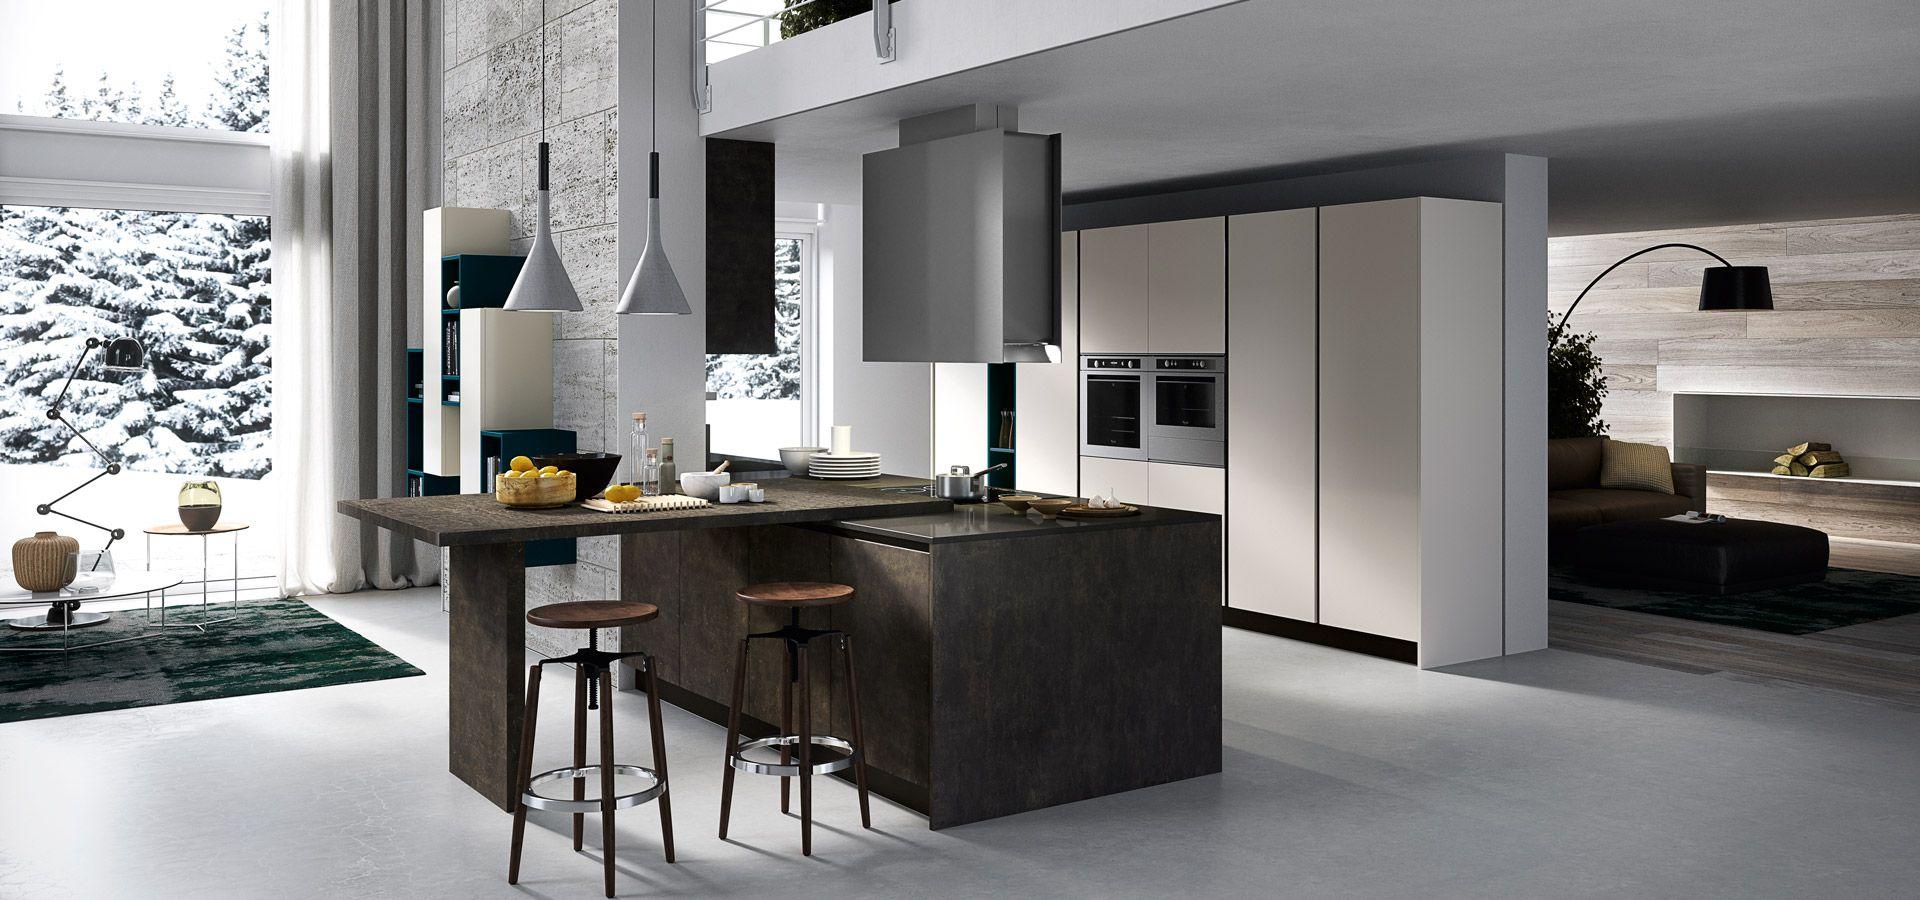 Cucina Moderna A Trieste.Pin Di Jilson Rodas Su Cocinas Idee Per Decorare La Casa